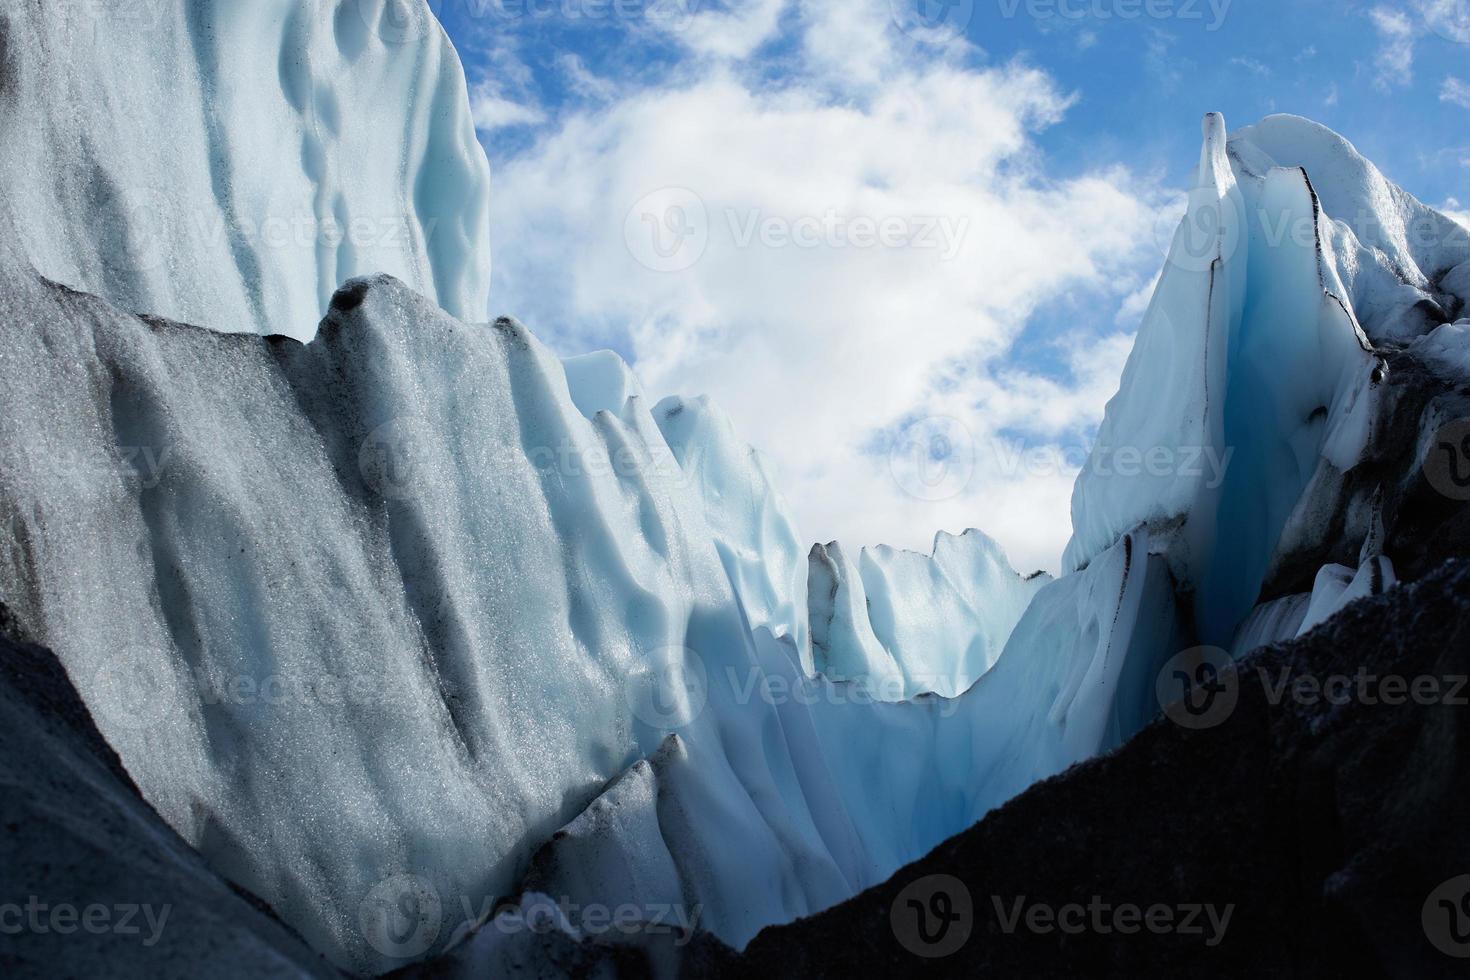 blaue Gletscherspitzen auf dem Matanuska-Gletscher, Alaska USA foto